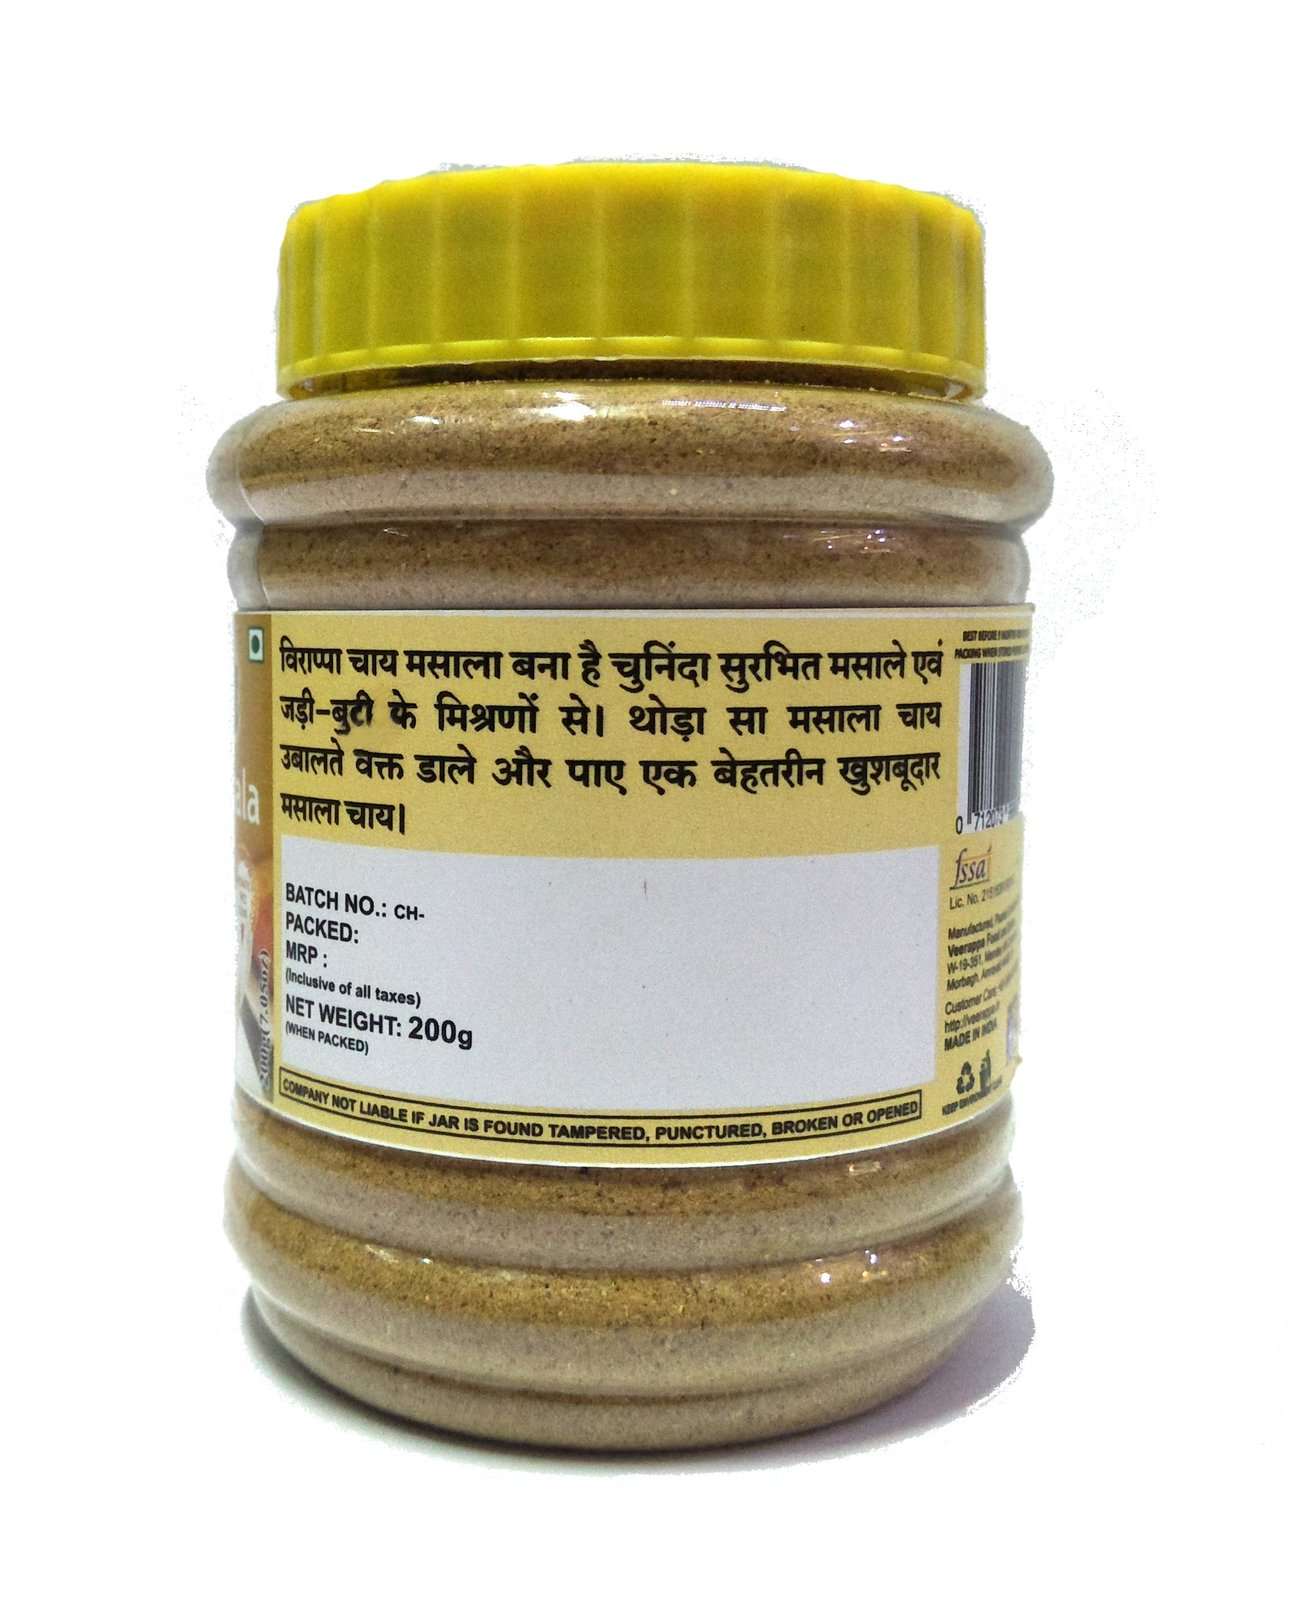 VEERAPPA Chai Masala 200g